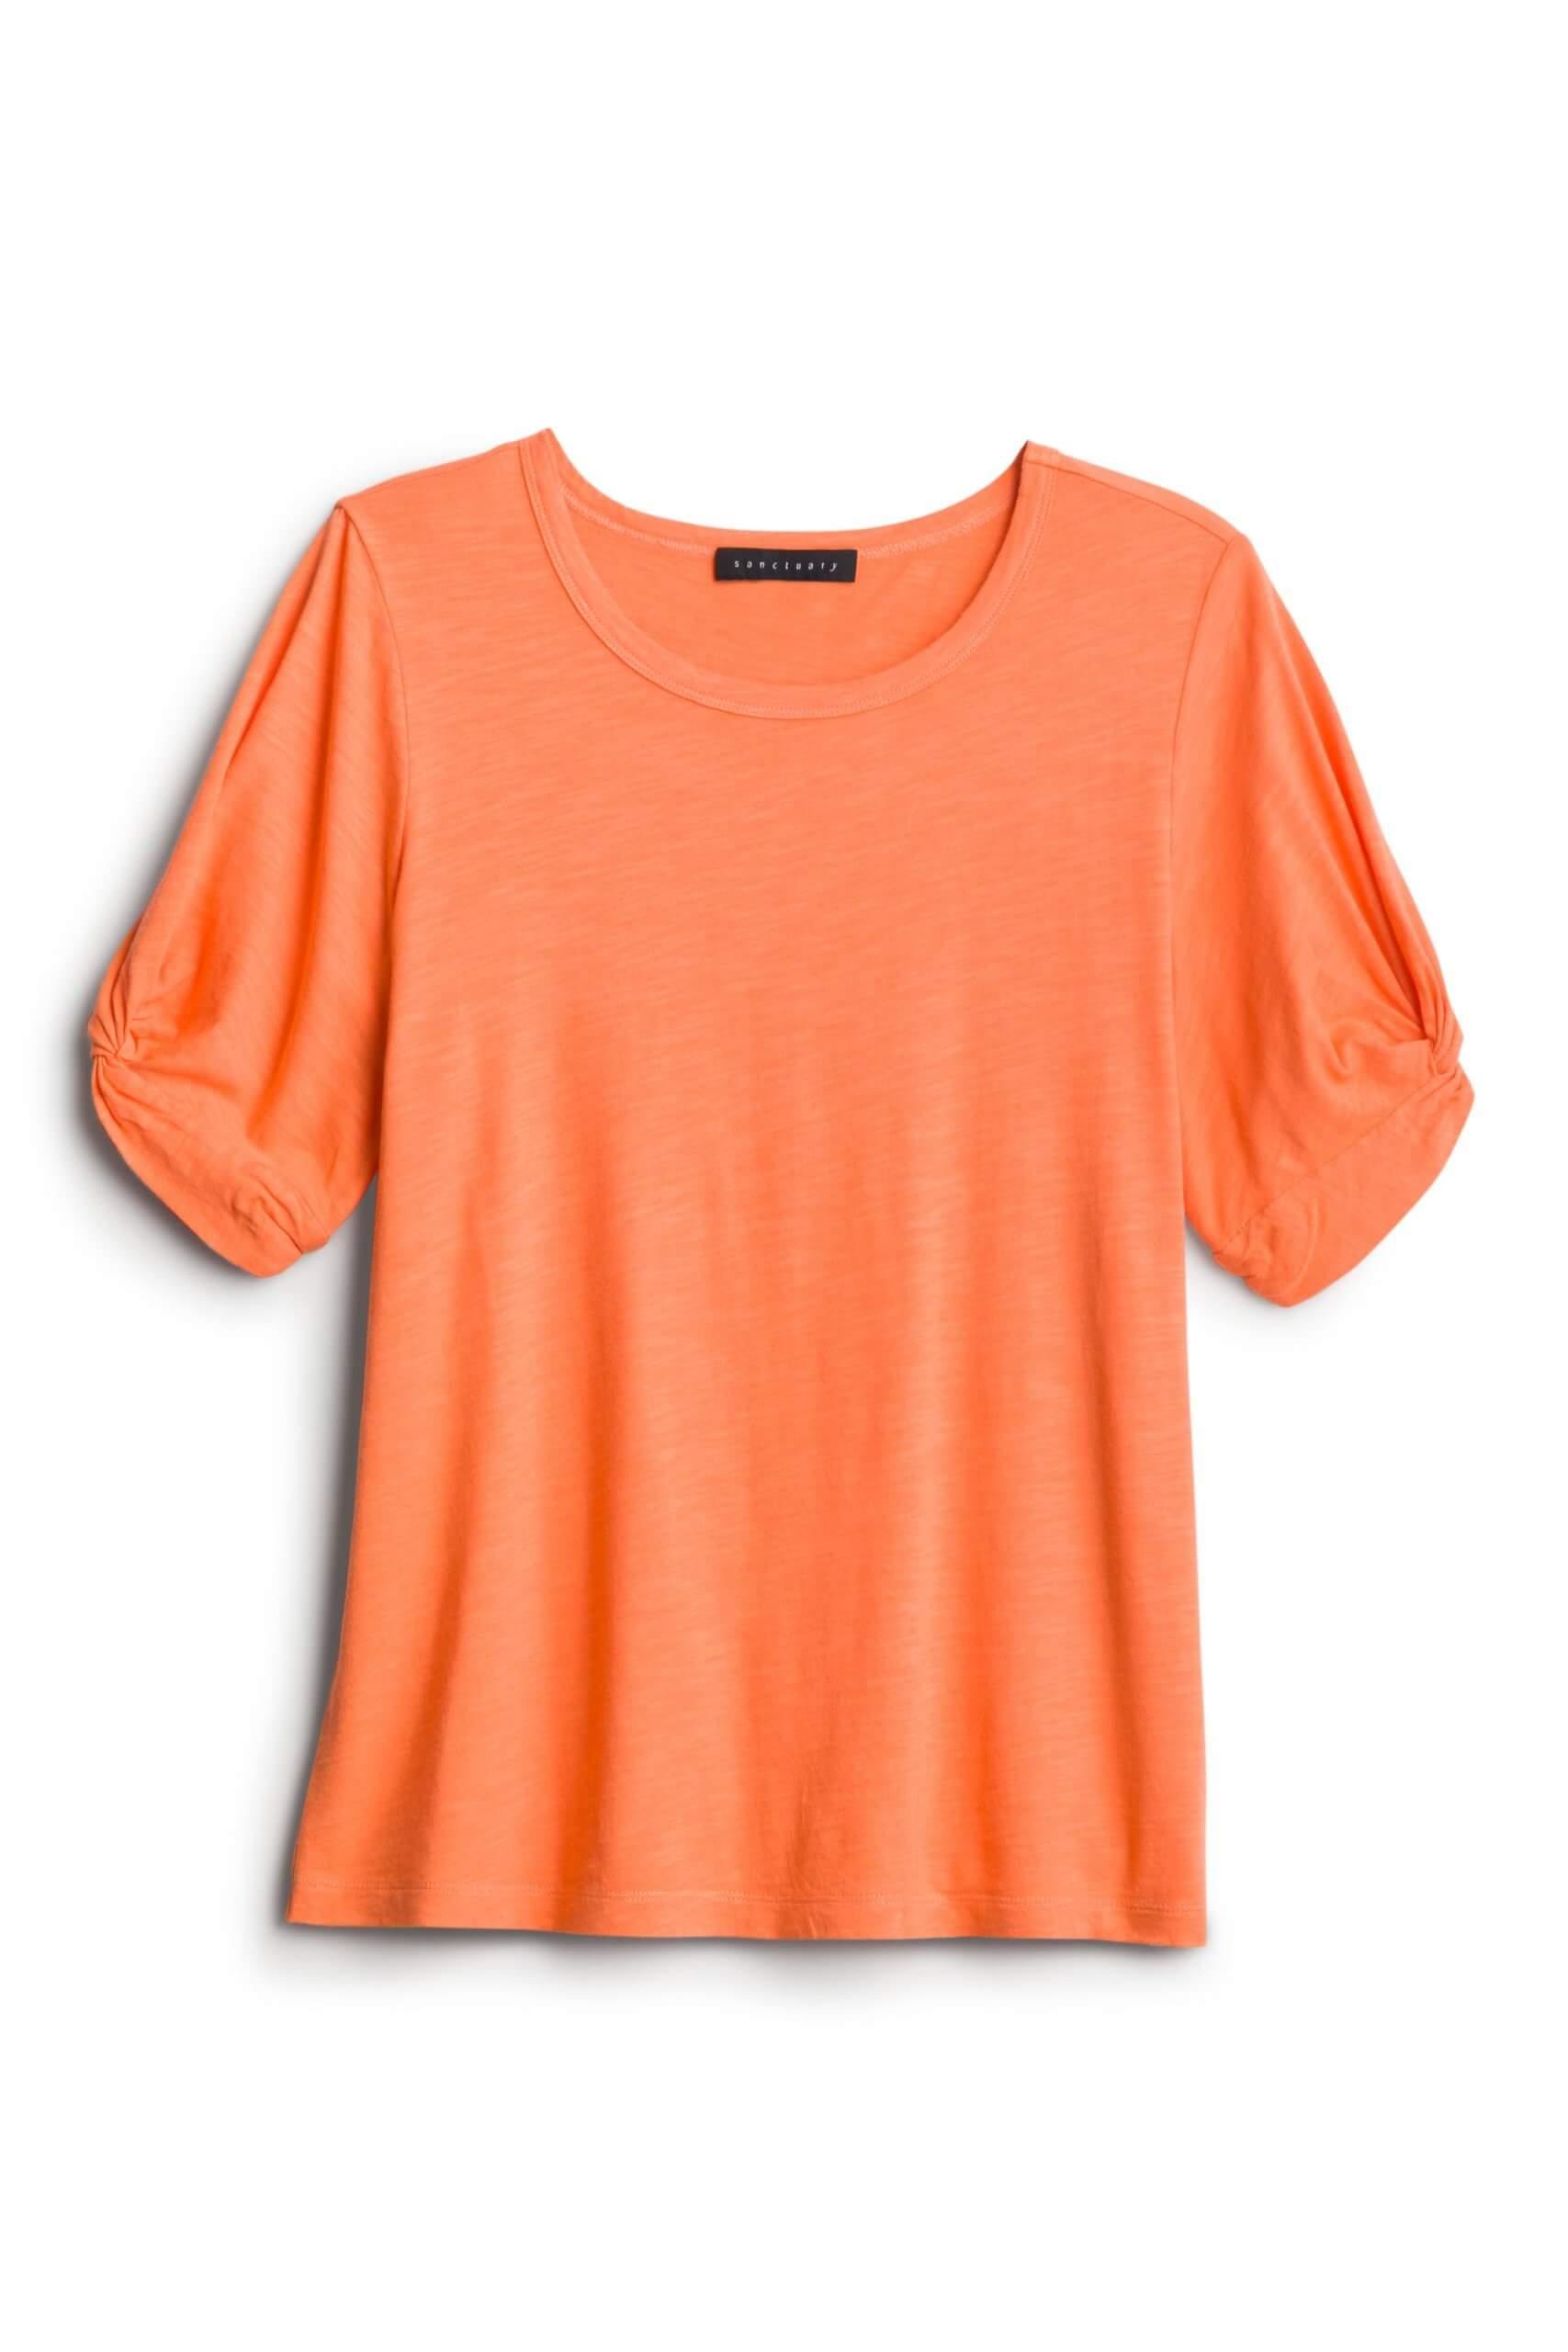 Stitch Fix Women's orange tee.